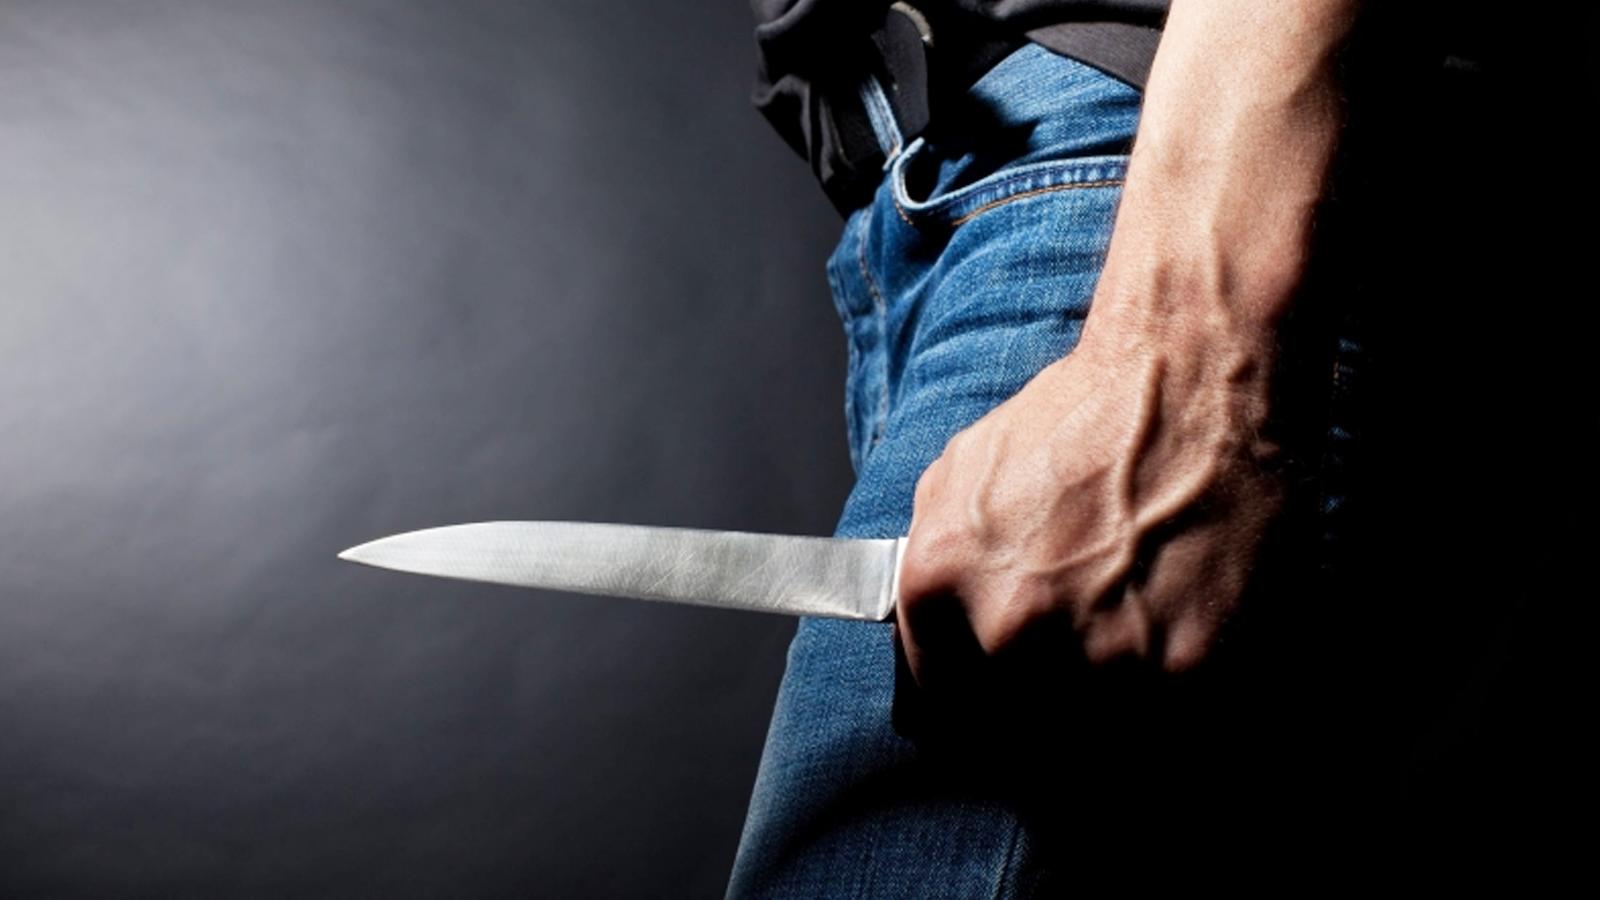 Под Брянском пассажиры приставили нож к горлу таксиста и угнали машину